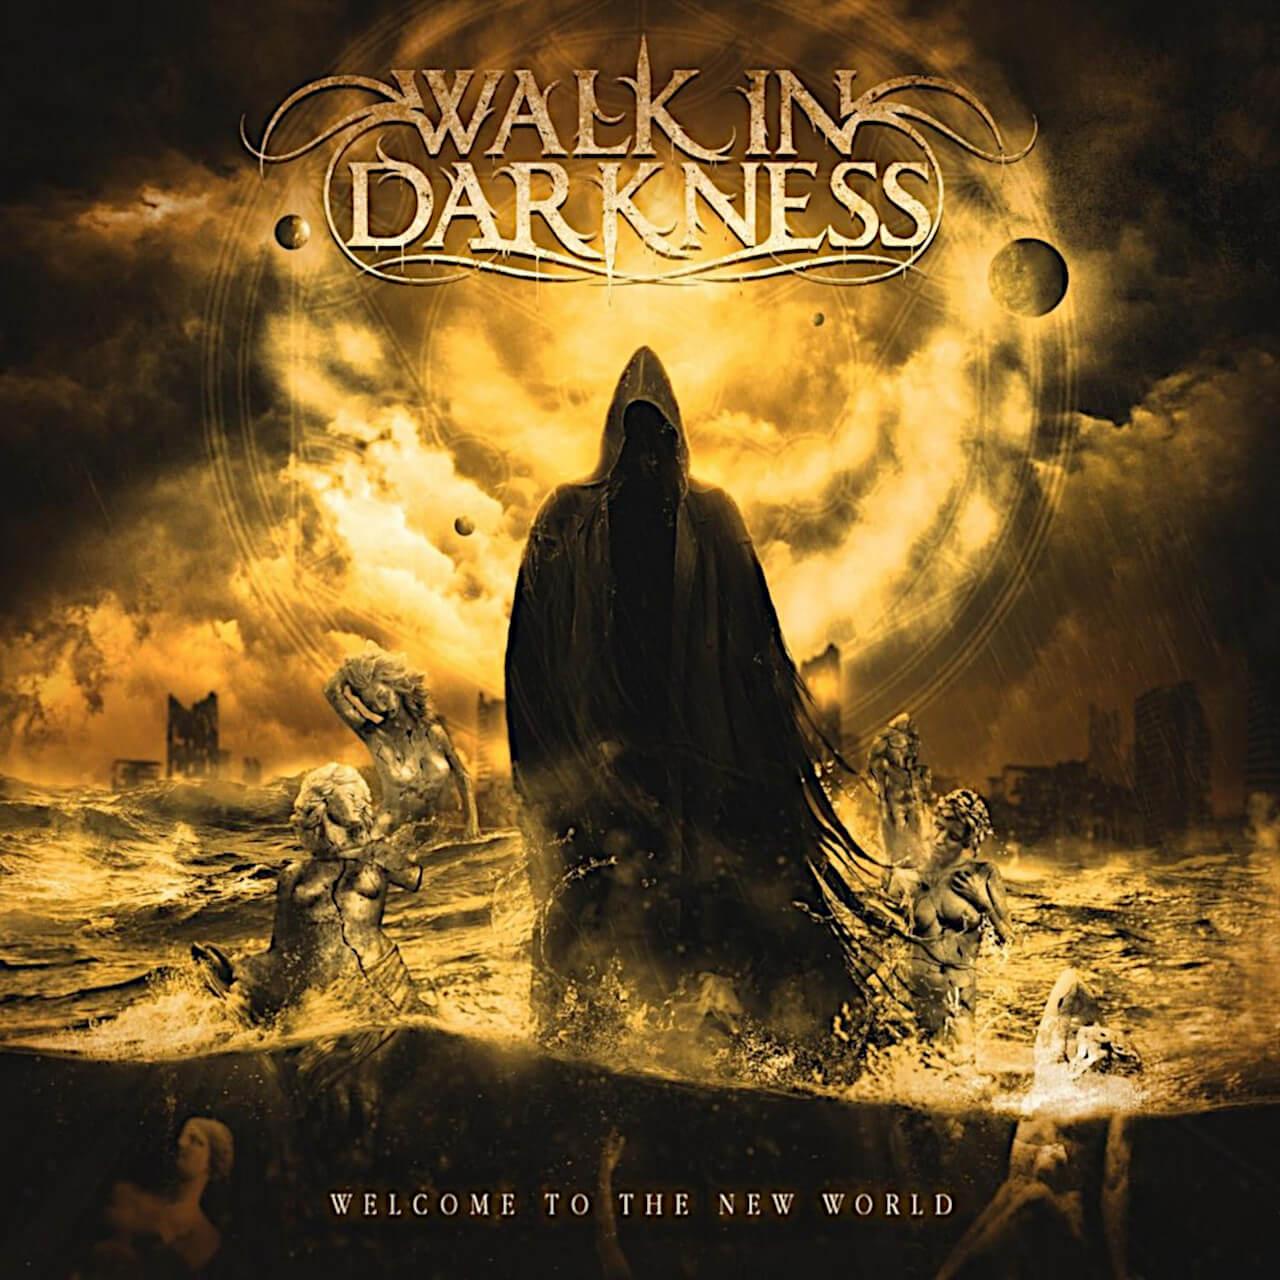 Walk in Darkness Album Cover